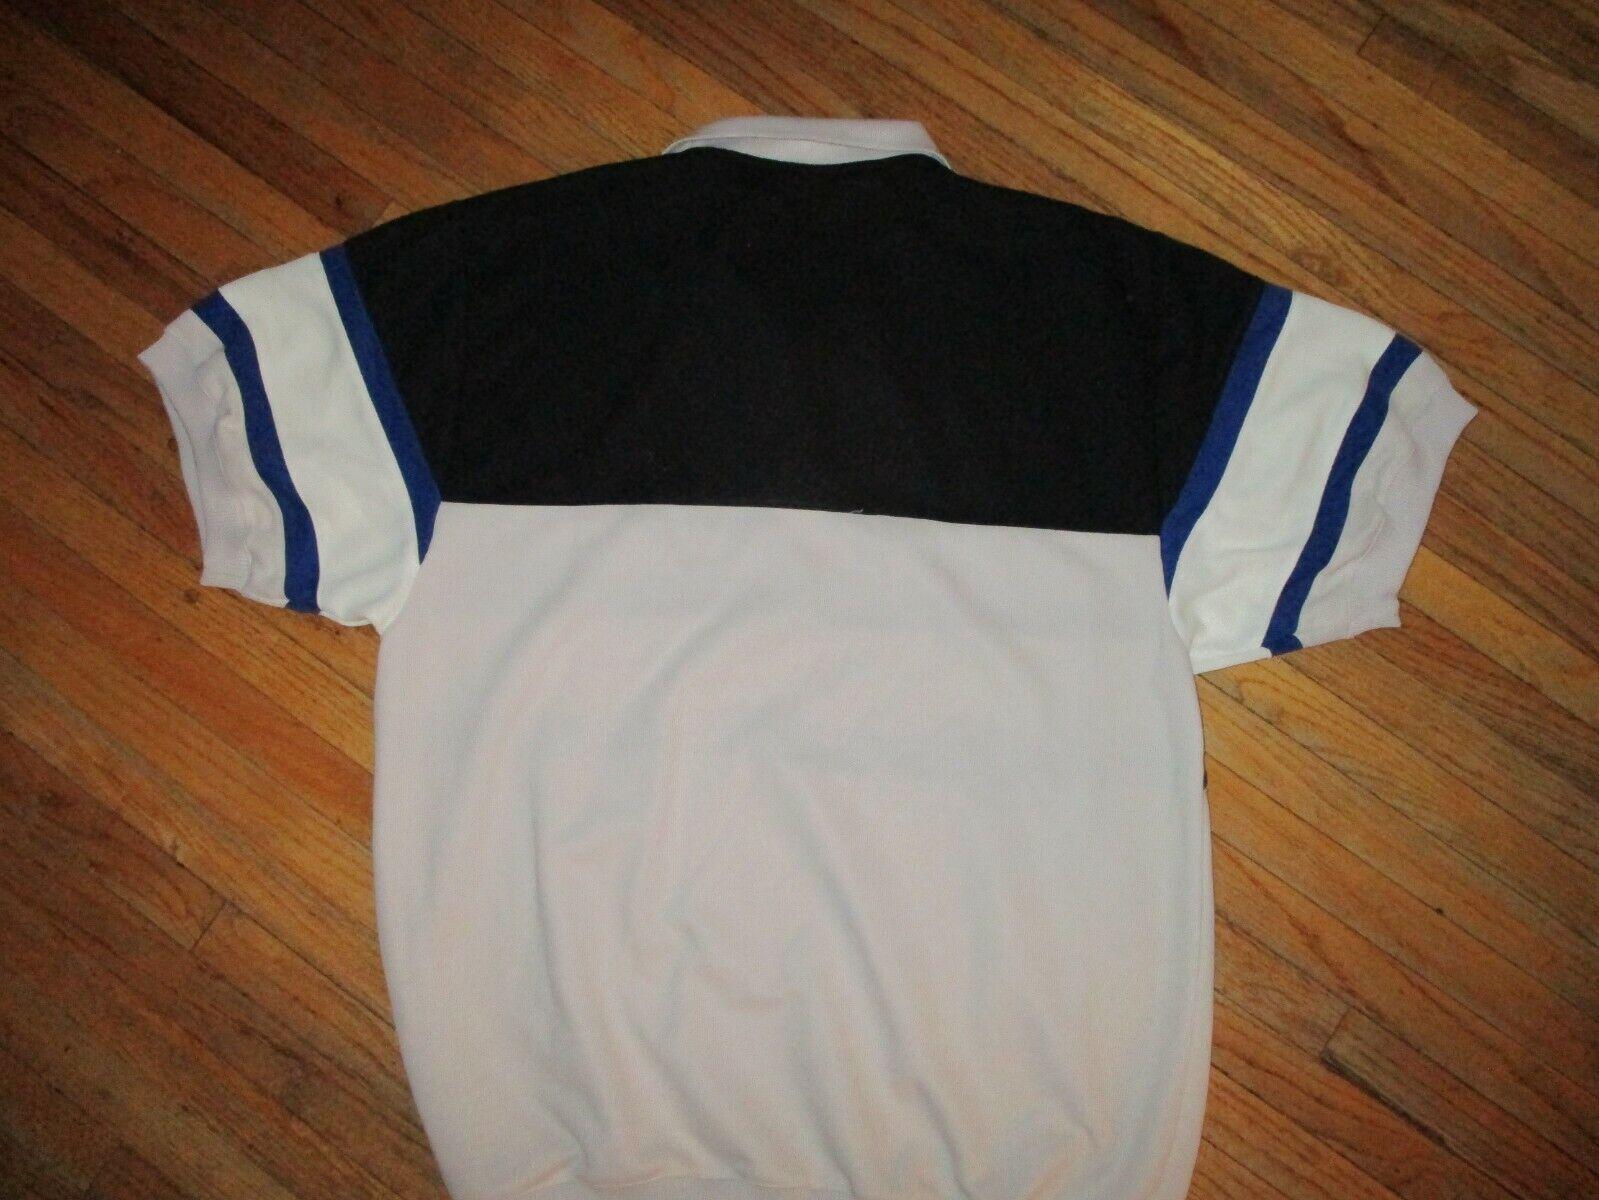 vtg 70s 80s SASSON BRAND POLO SHIRT Short Sleeve … - image 4